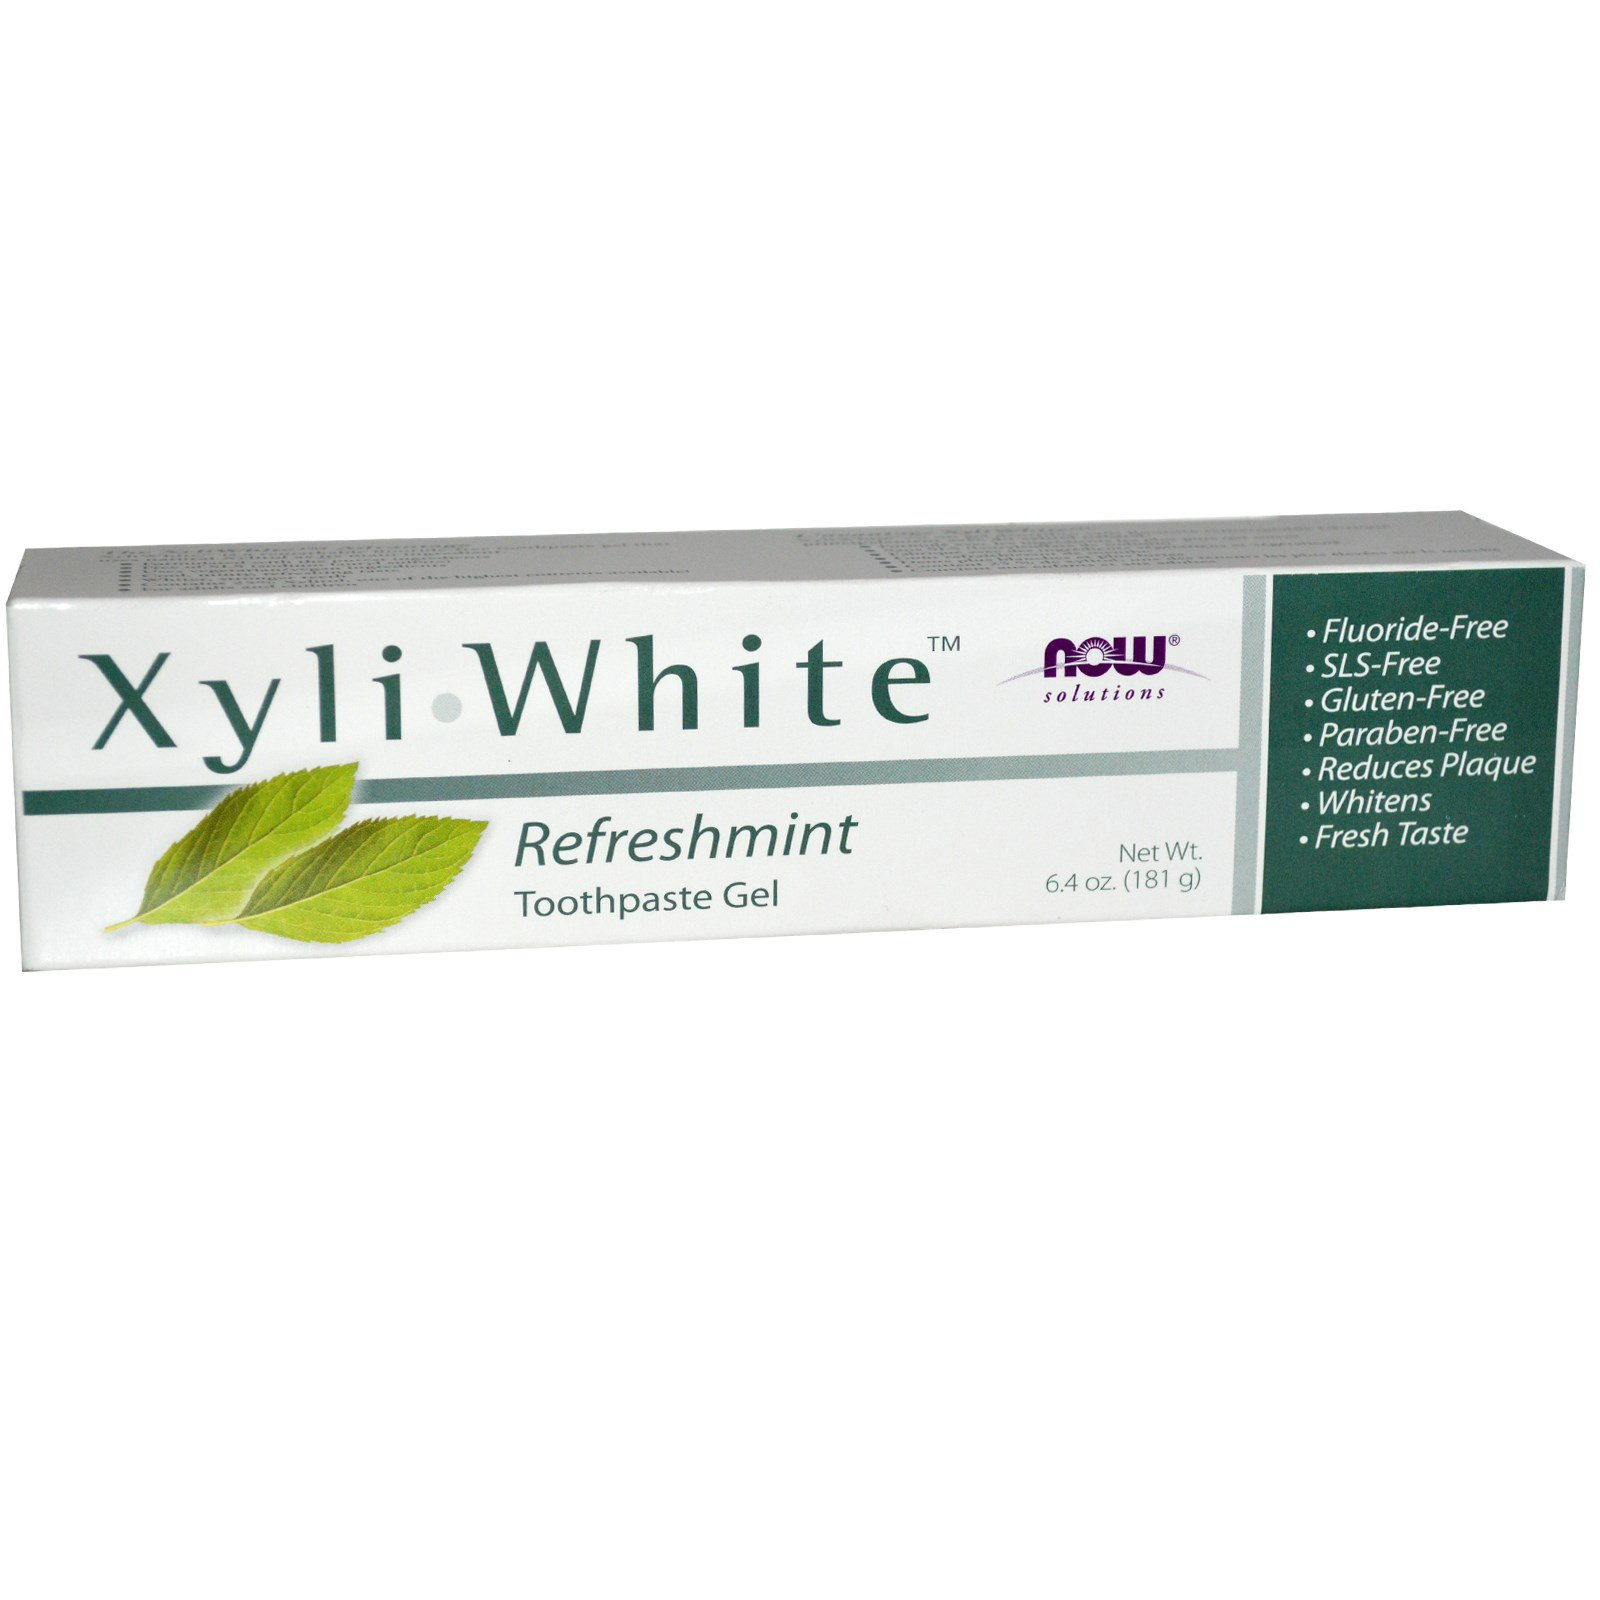 Toothpaste Gel Refreshmint (181 g)